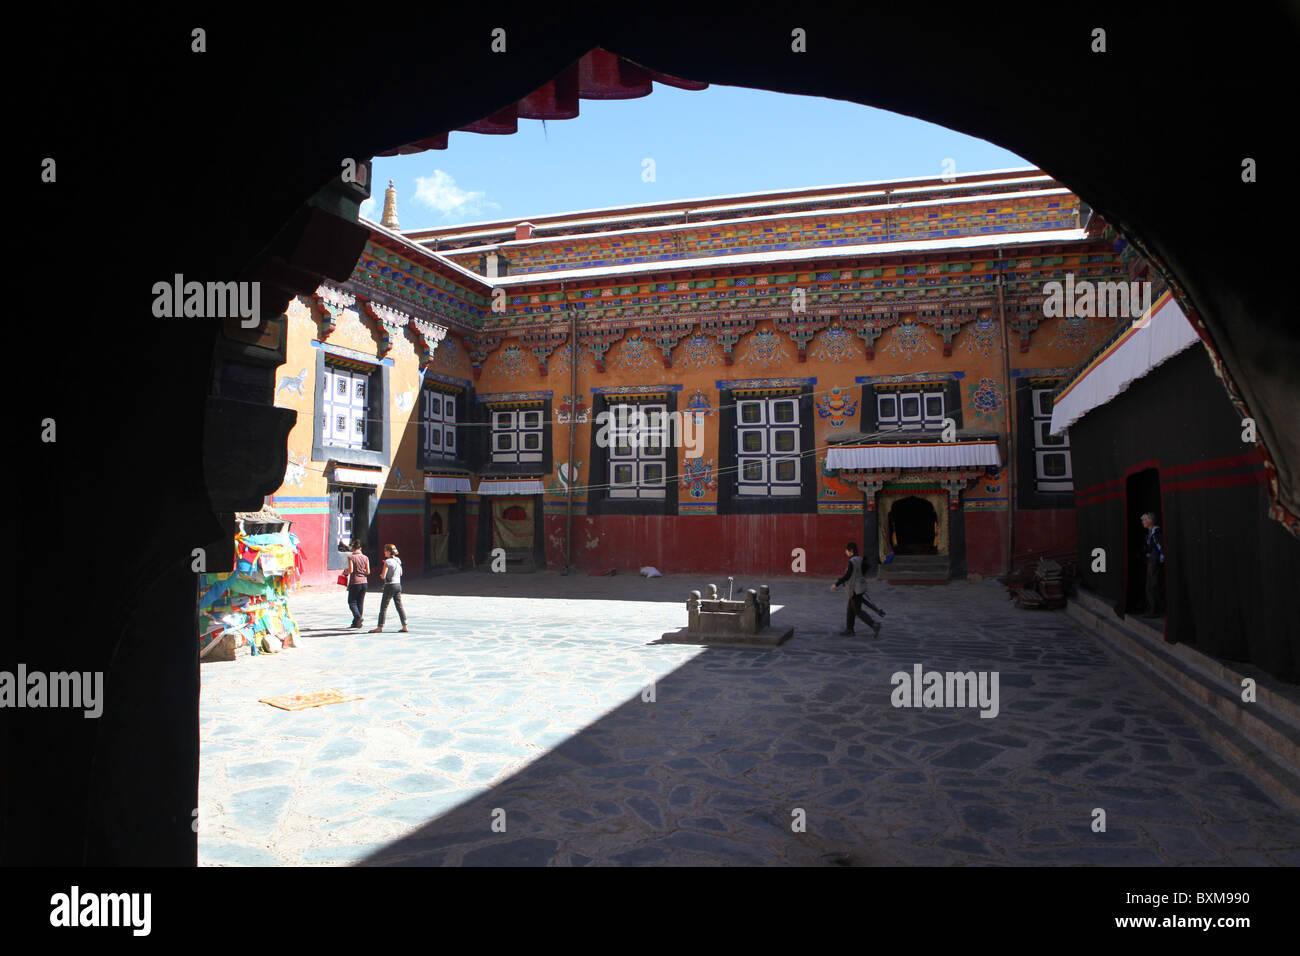 The Sakya Monastery, a Buddhist monastry about 127km west of Shigatse in Tibet. - Stock Image